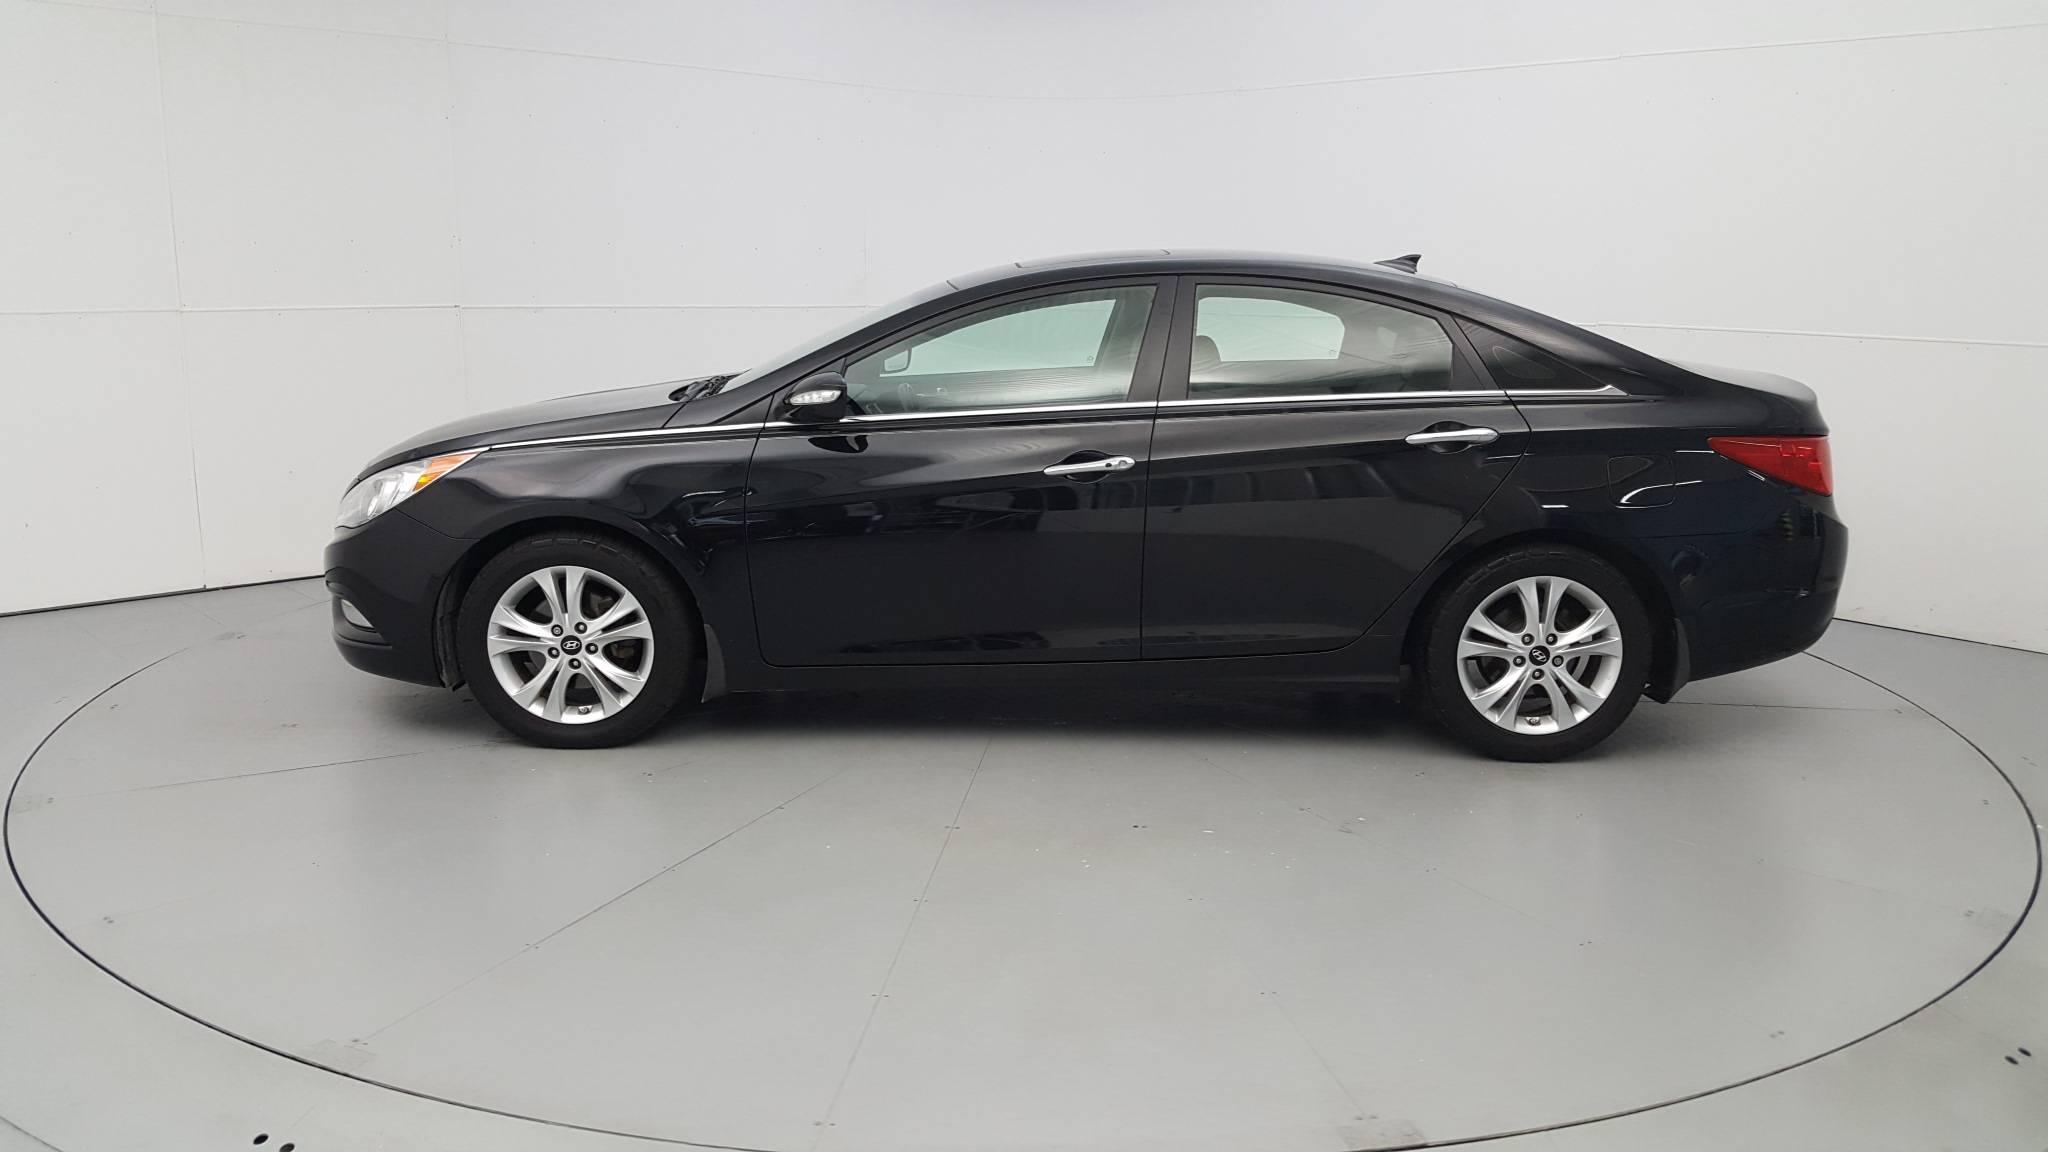 Pre-Owned 2013 Hyundai Sonata Limited PZEV